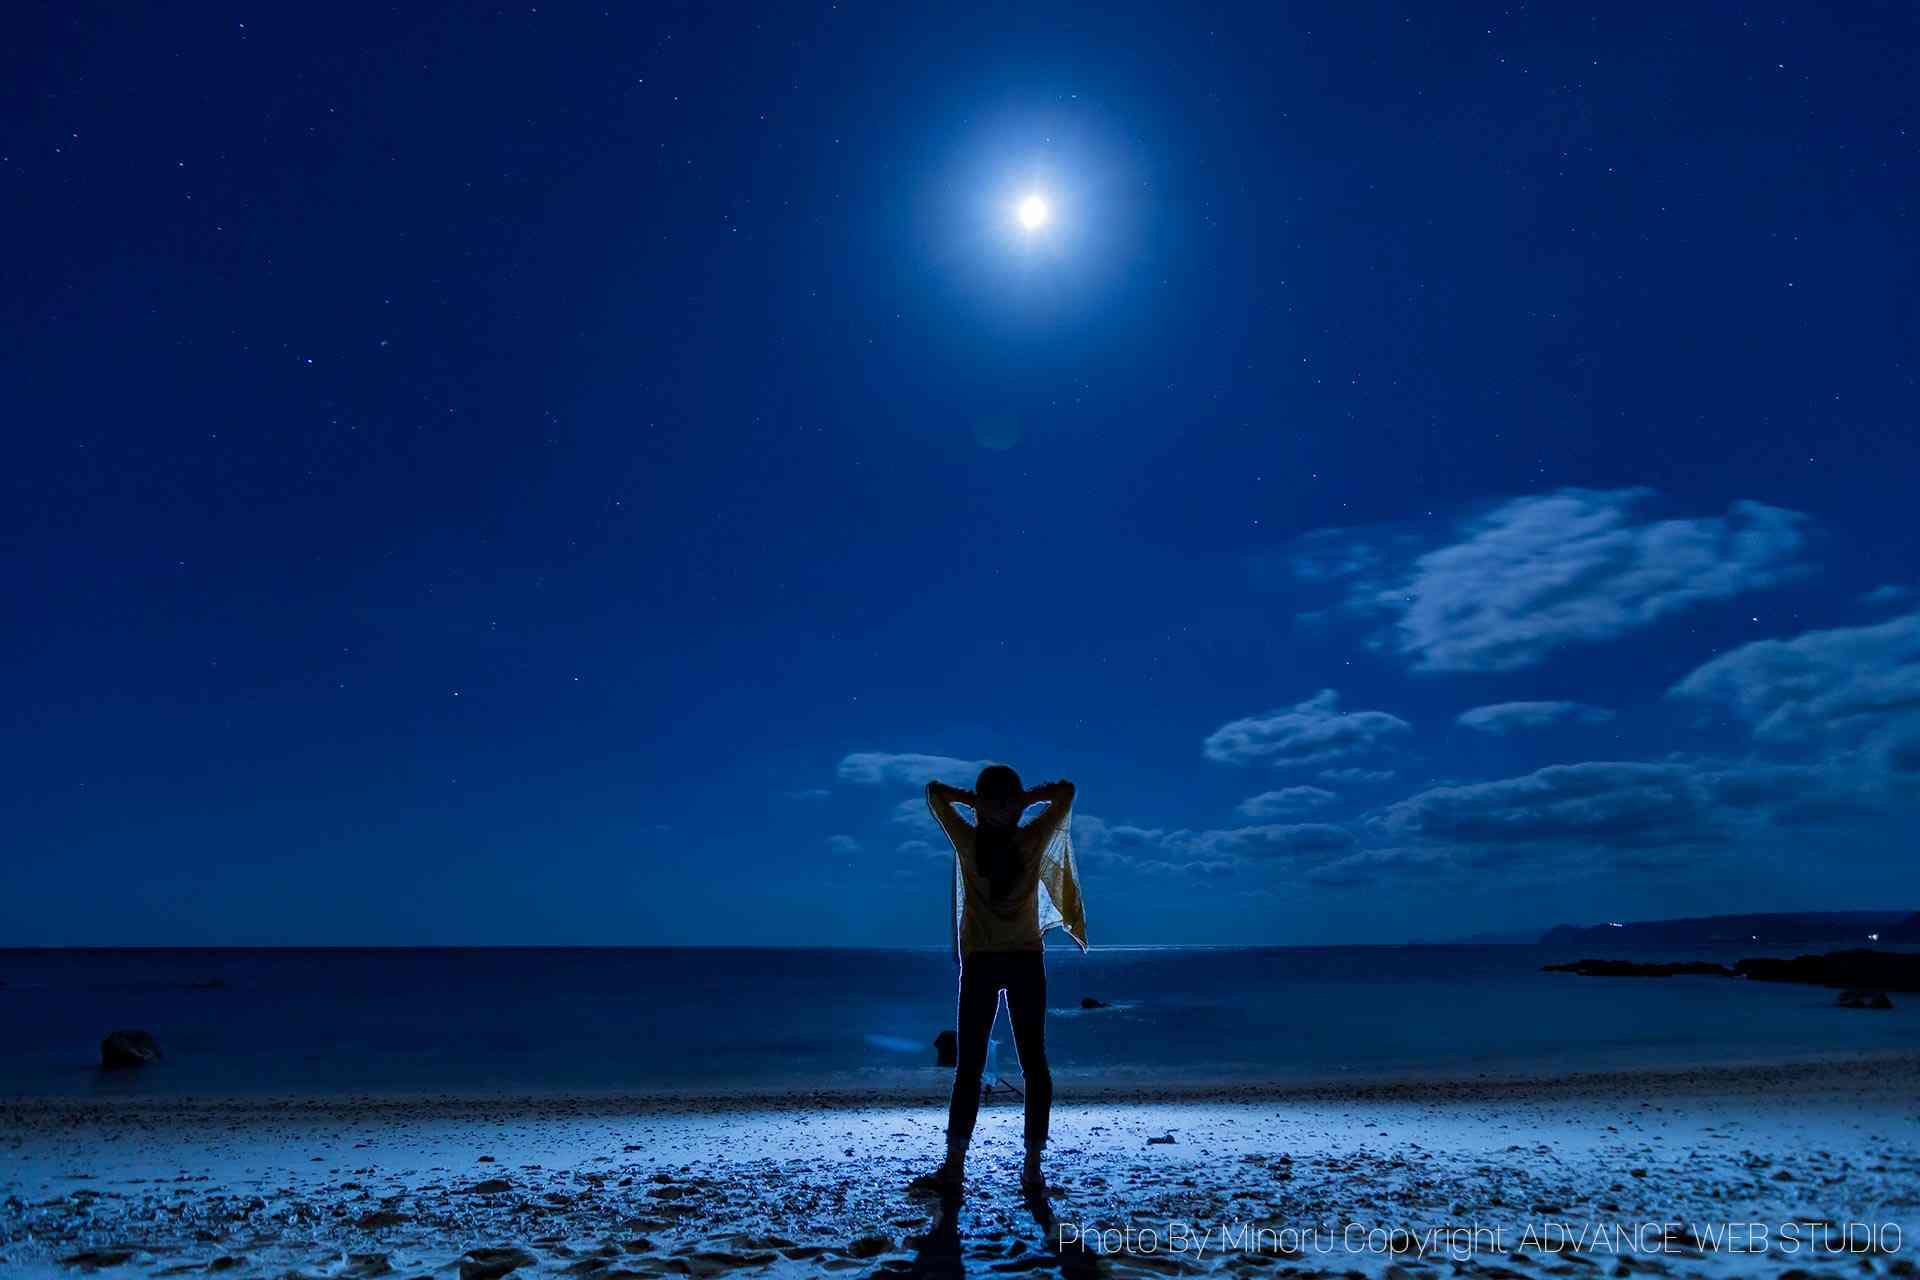 笠利町用安海岸で月光浴